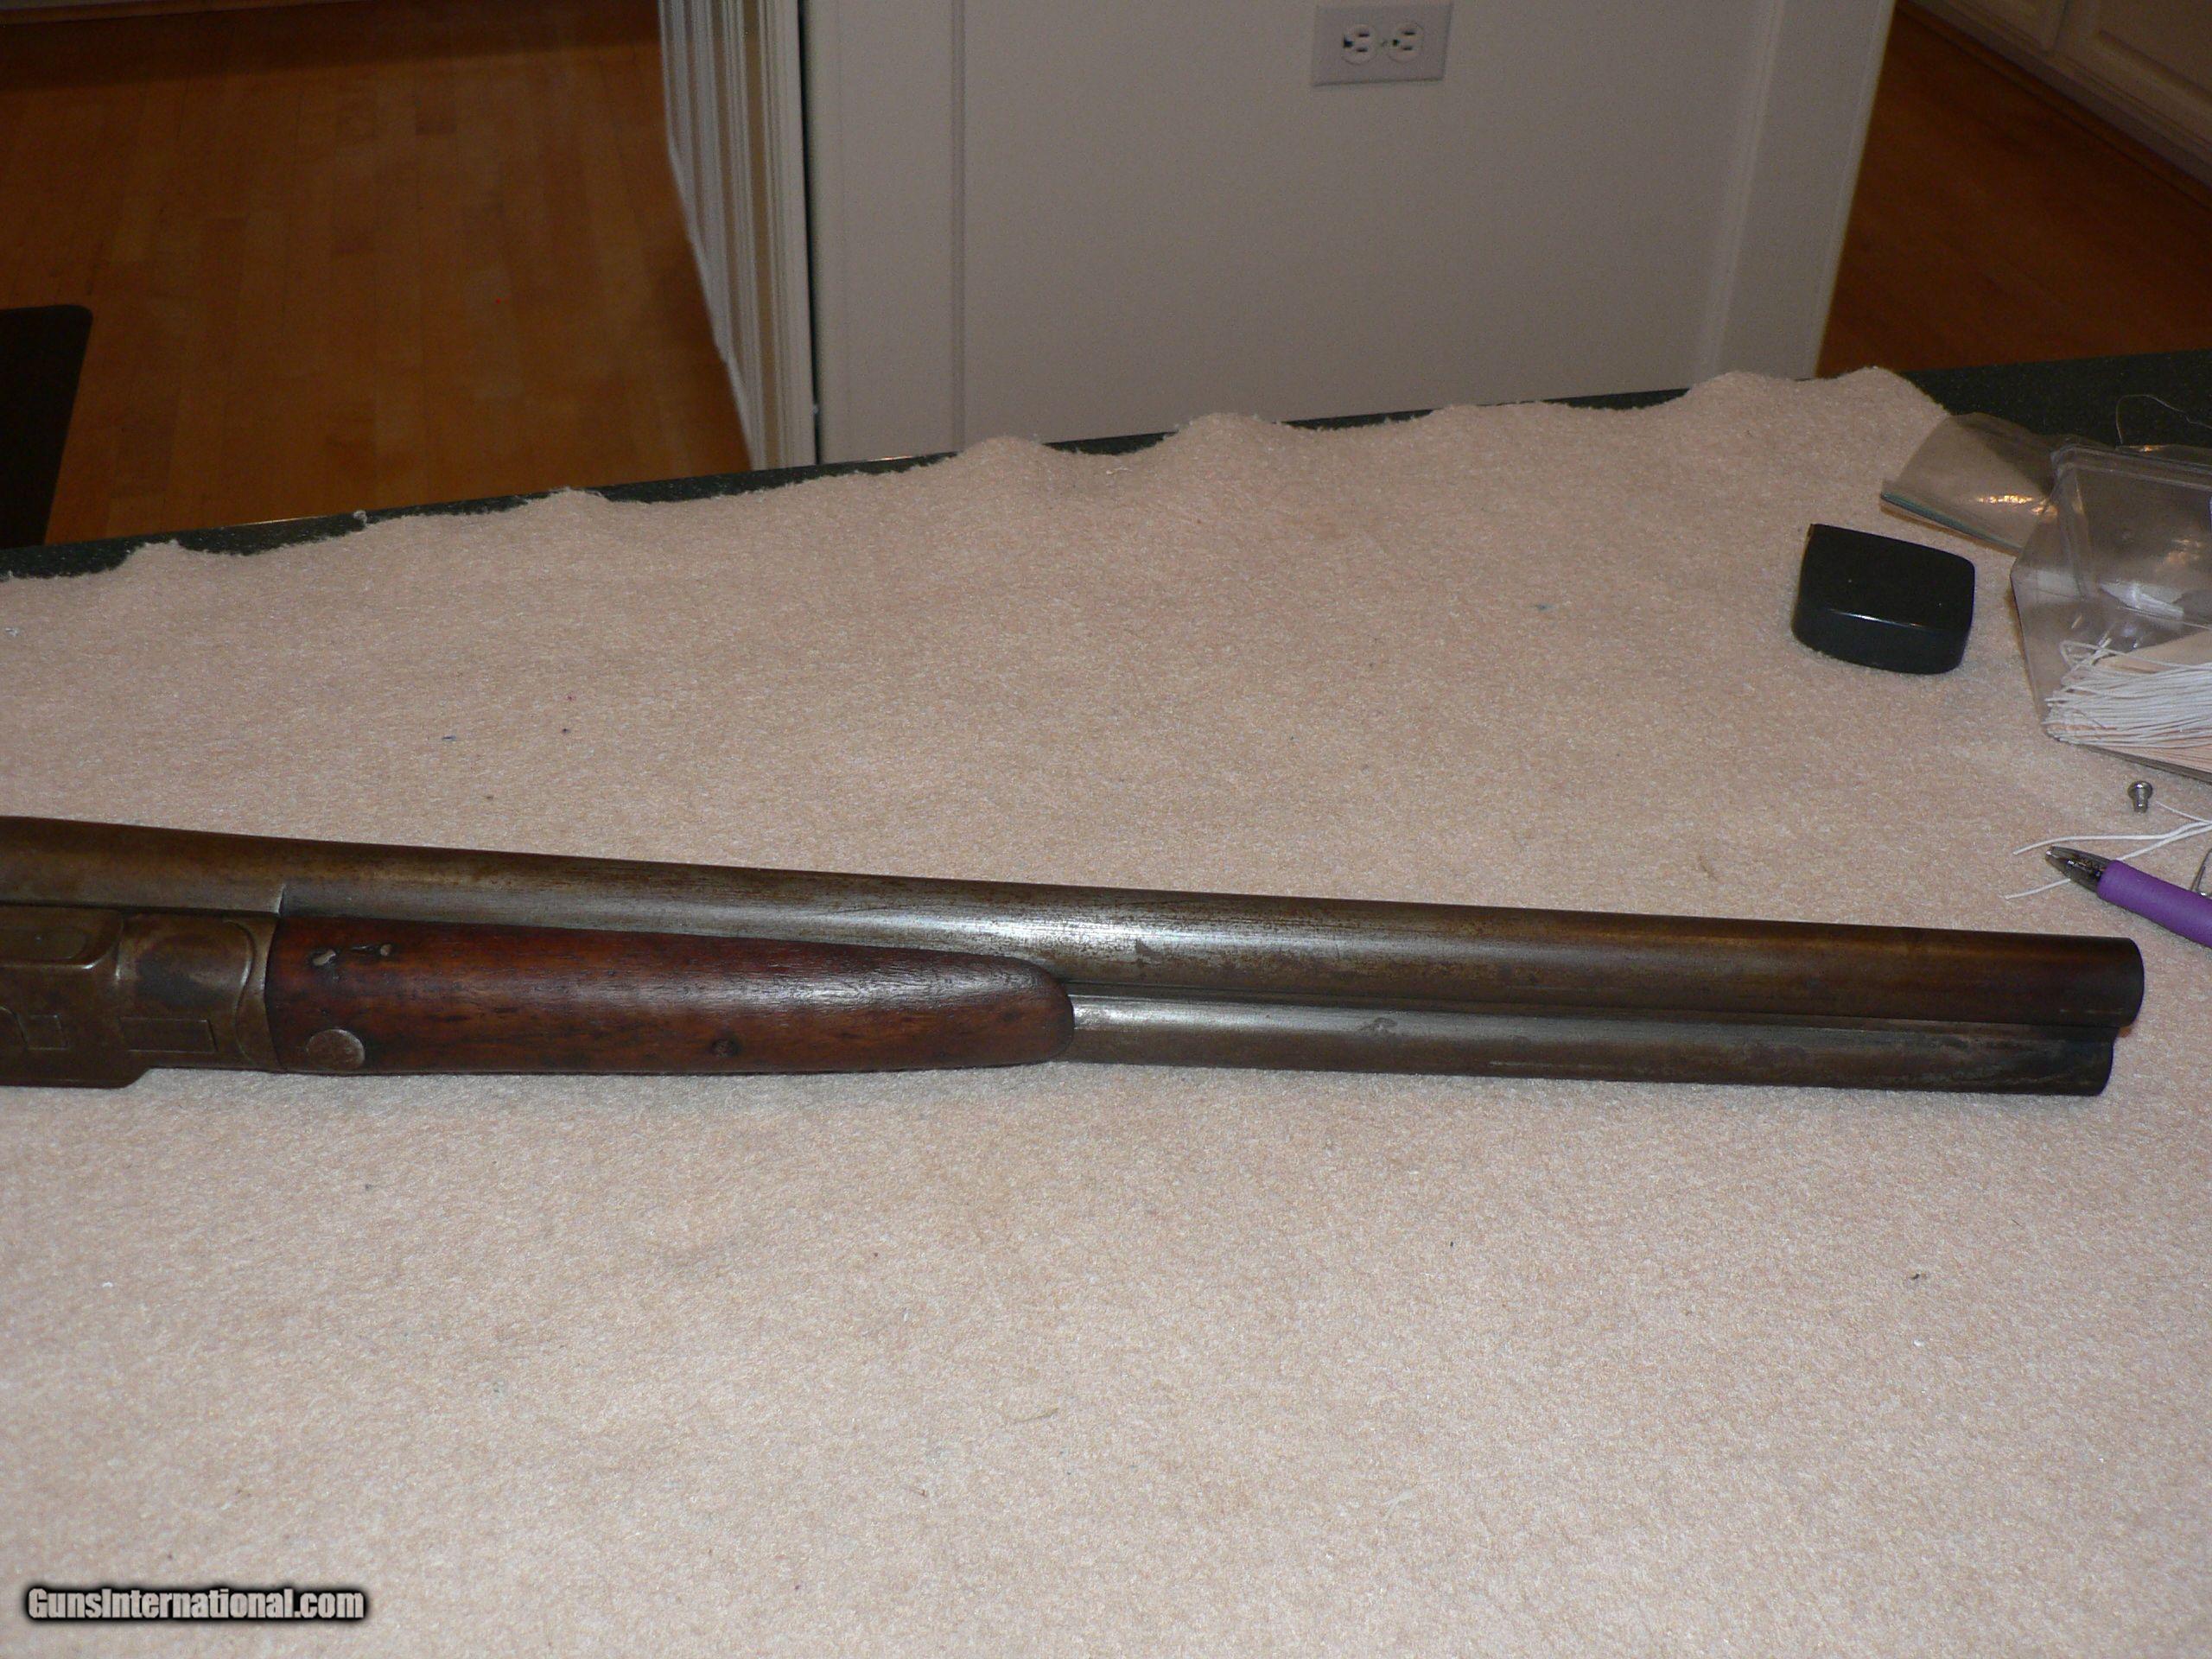 Dumoulin Sxs Percussion Shotgun For Sale